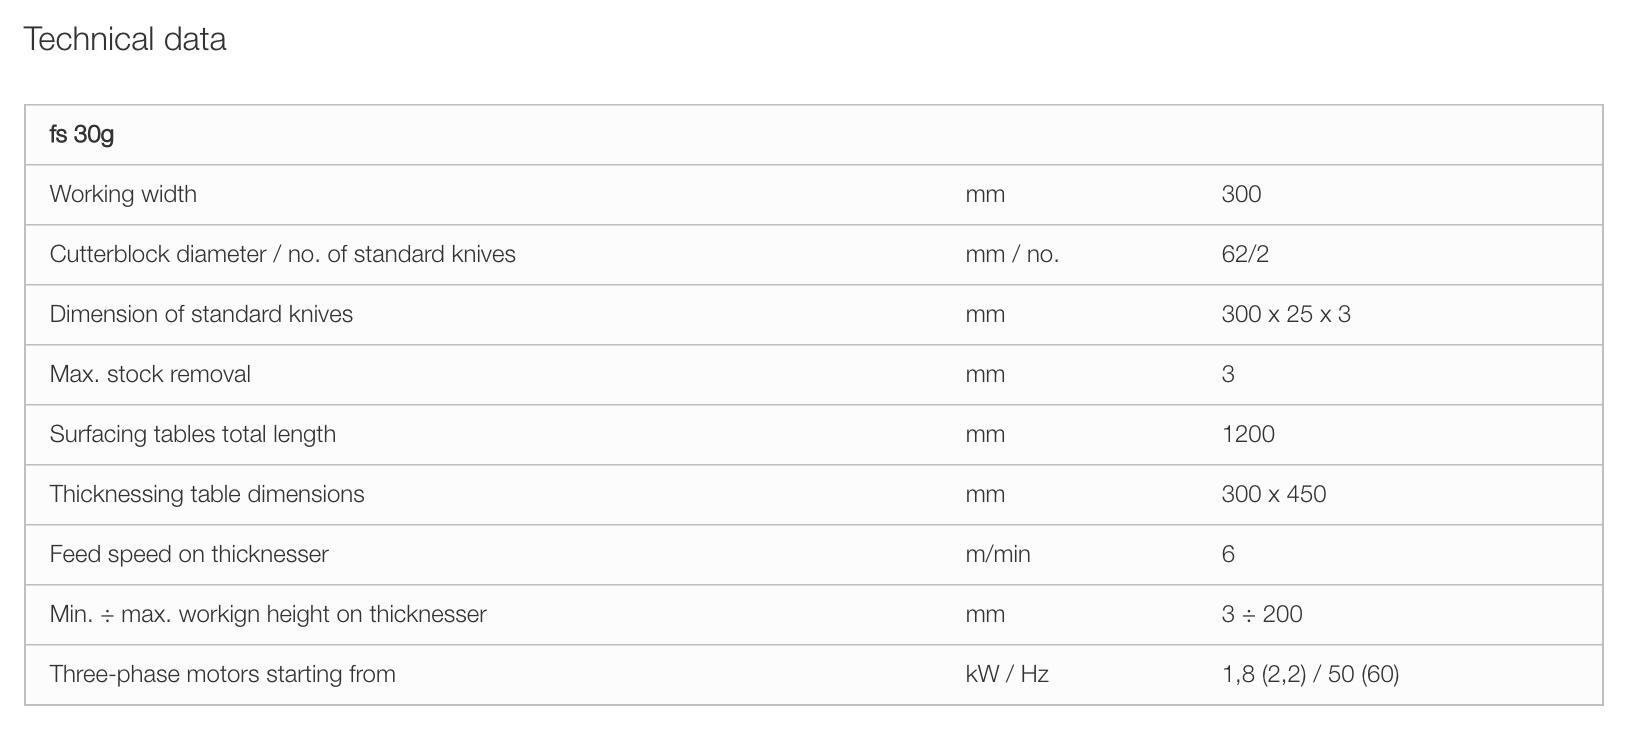 technical data for minimax fs 30g